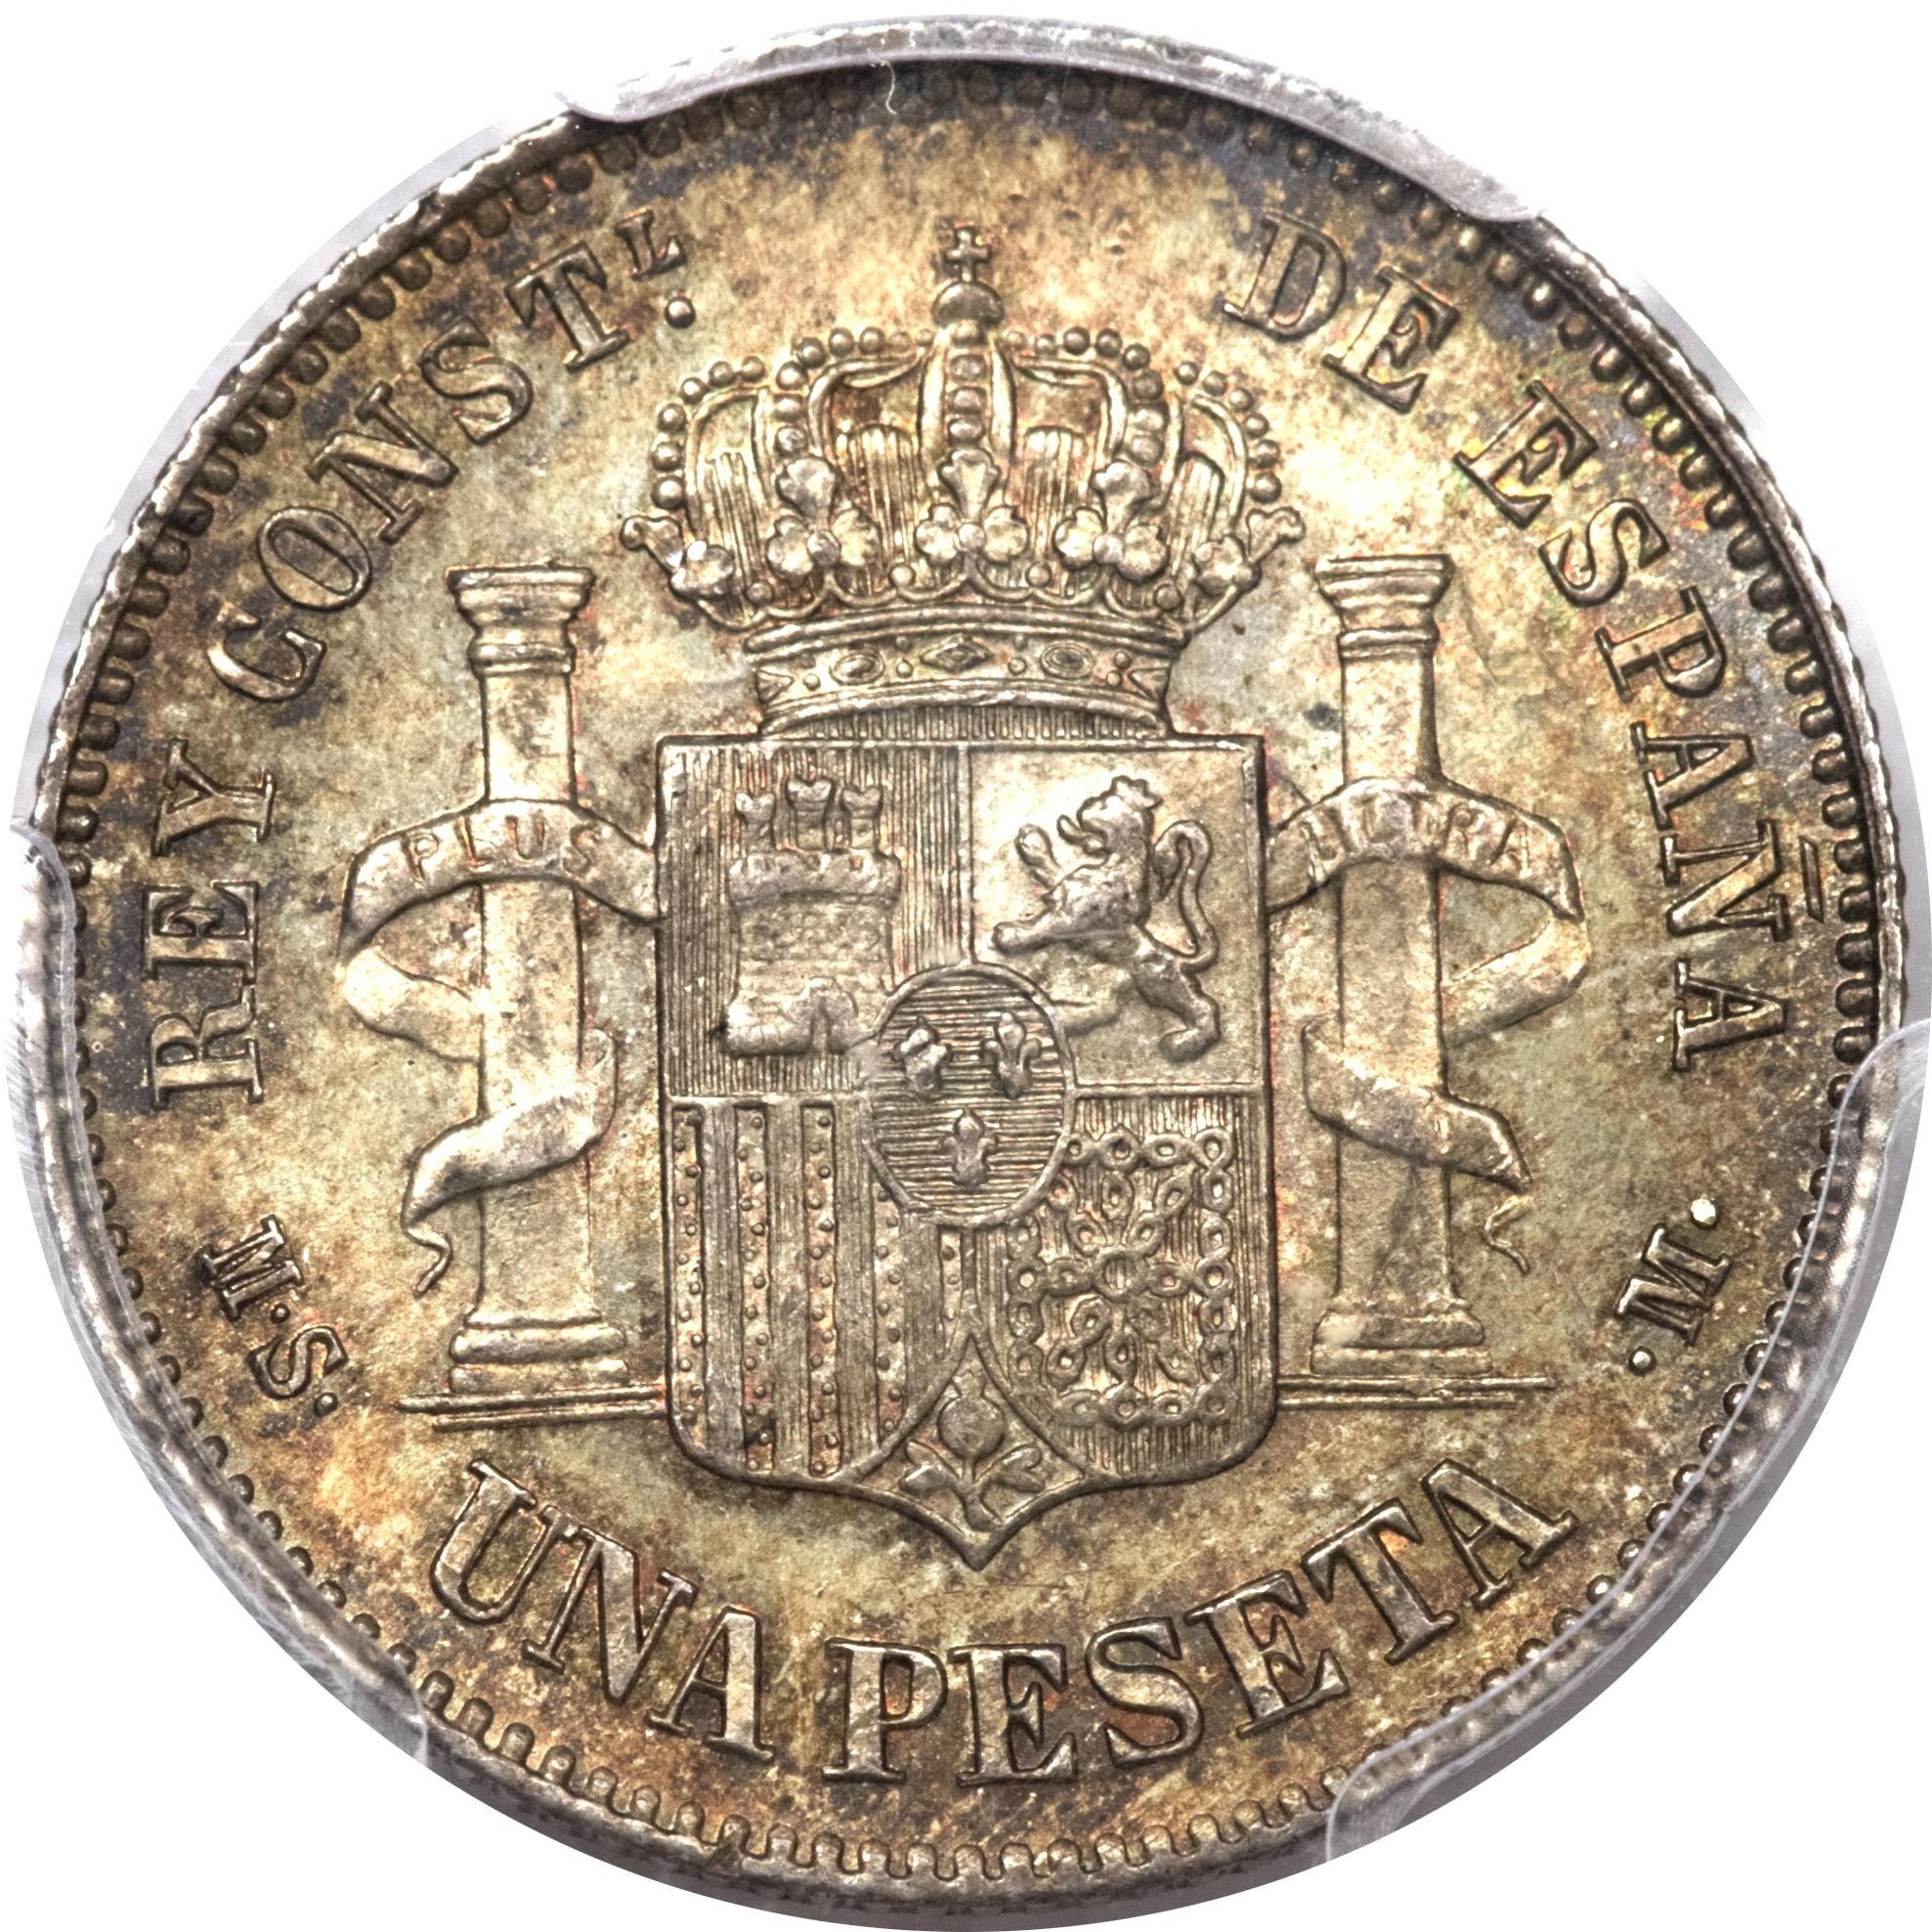 Spain 1 Peseta (1881-1885 Alfonso XII)